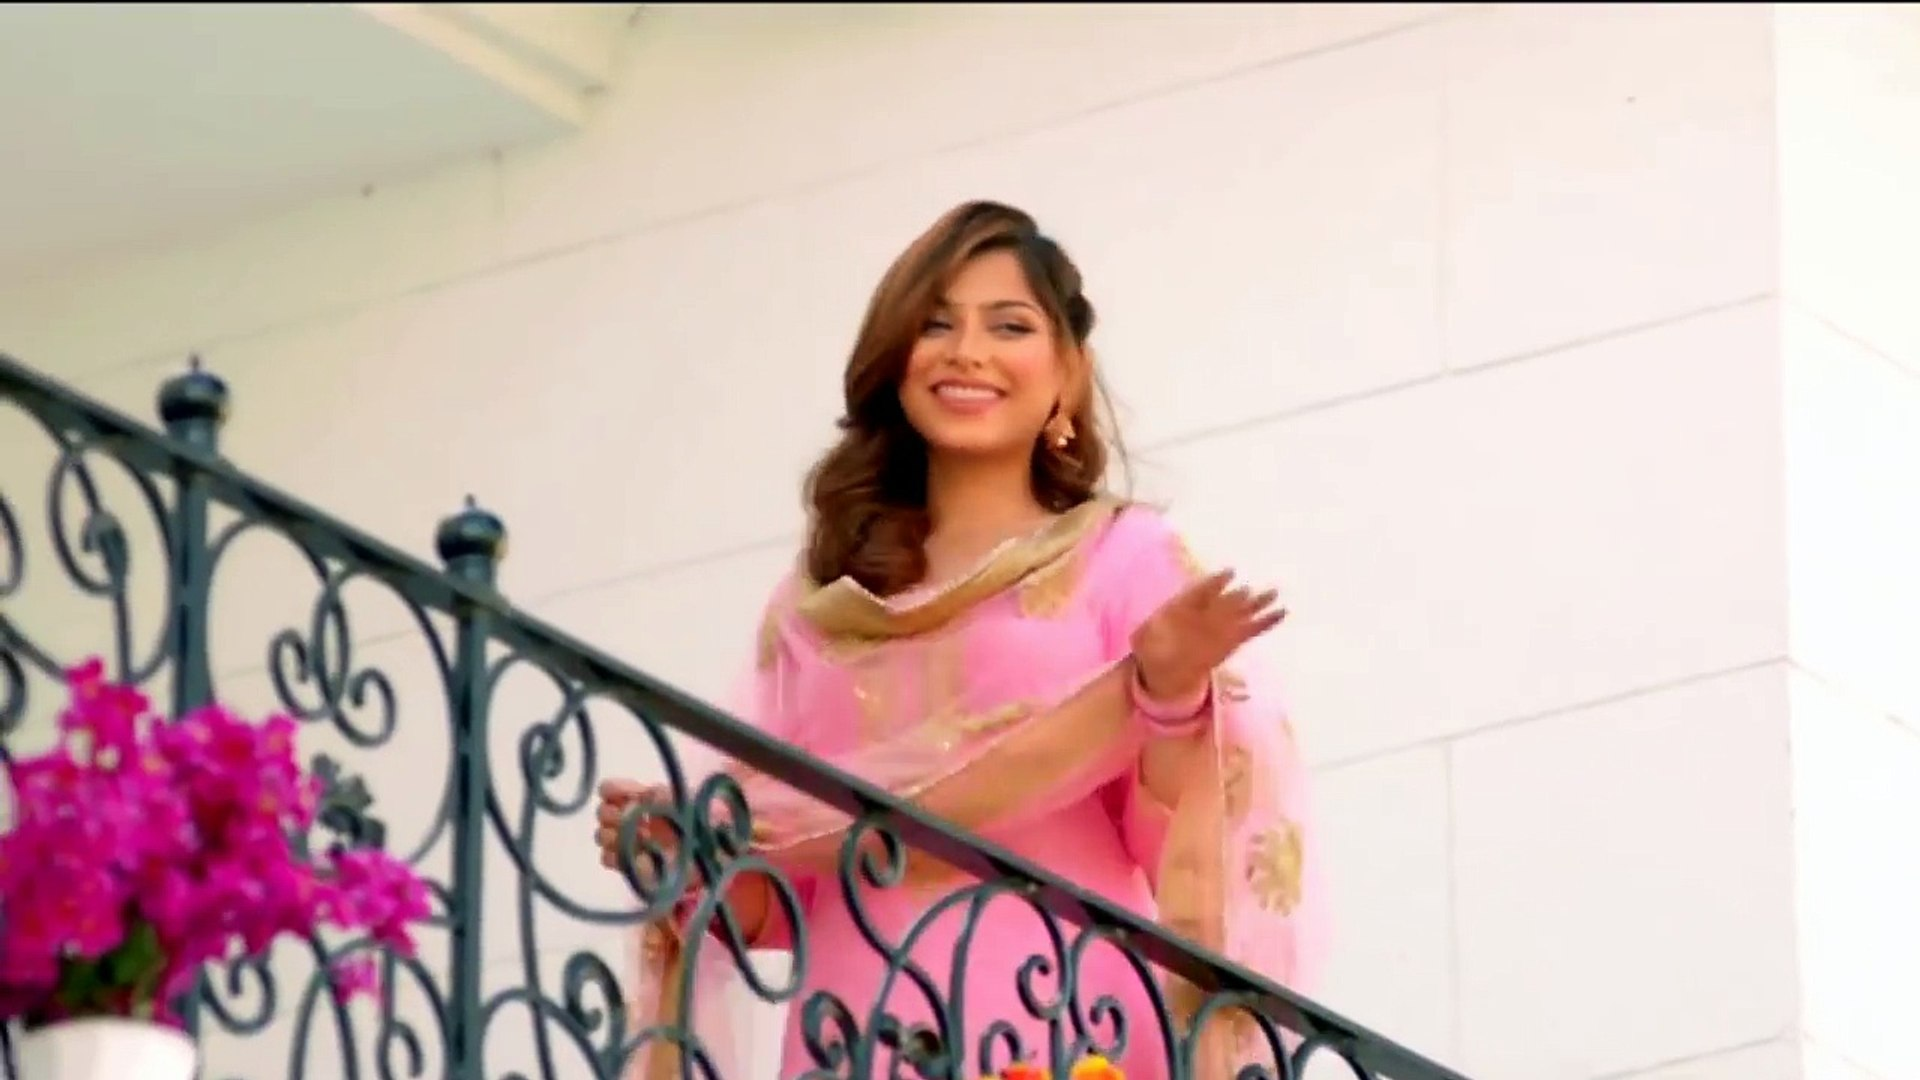 JODI TERI MERI whatsapp status video Jassi Gill - punjabi song jassi gill jodi teri meri status, wha